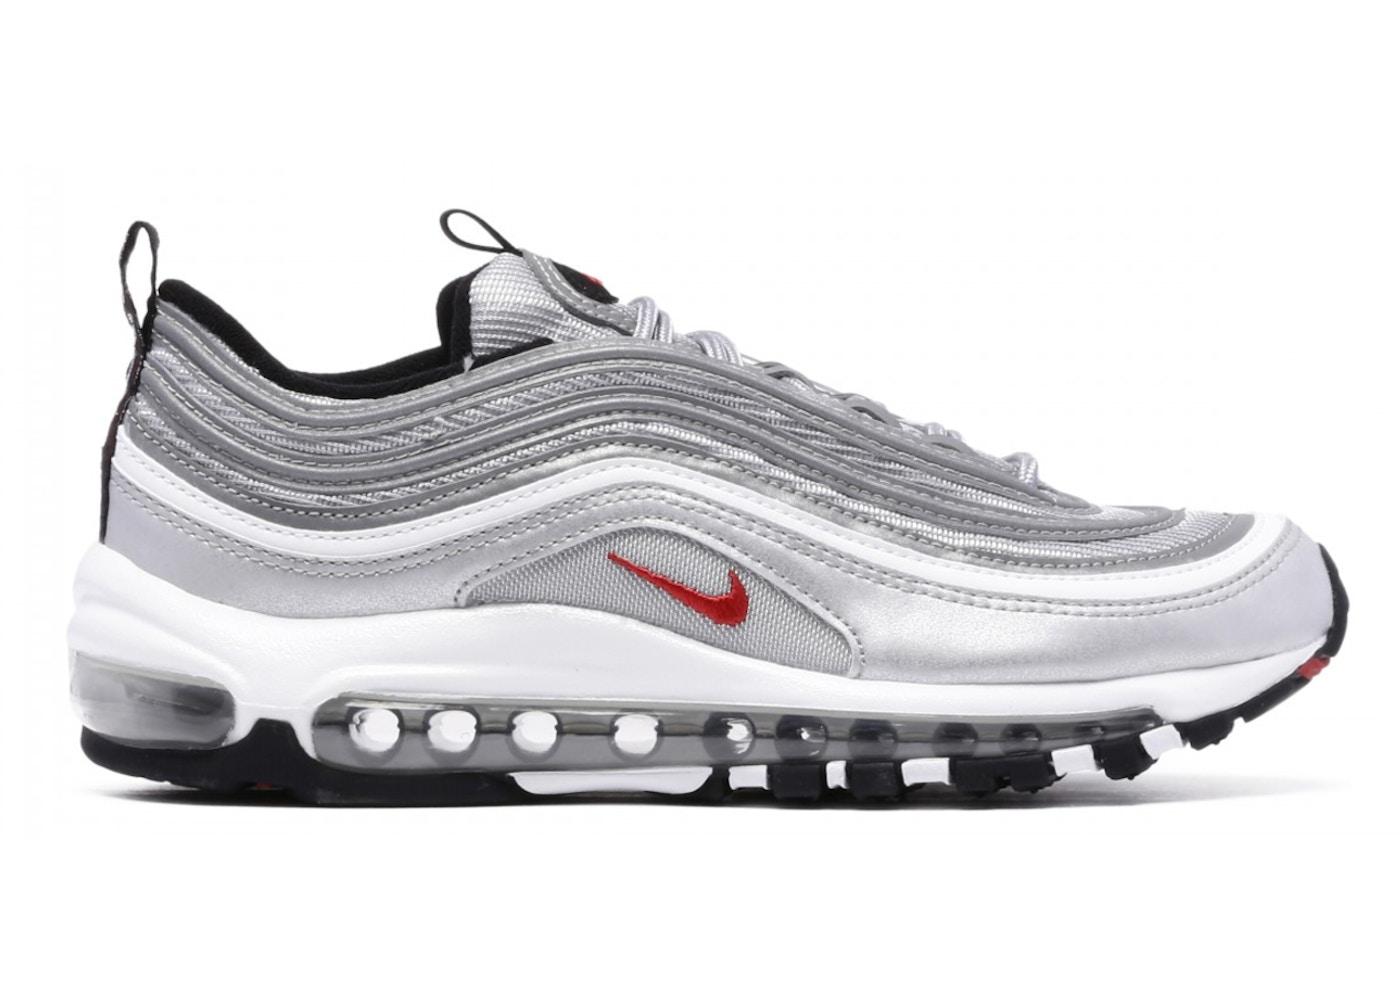 Off White x Nike Air Max 95 White Silver Men's Size 609048 159